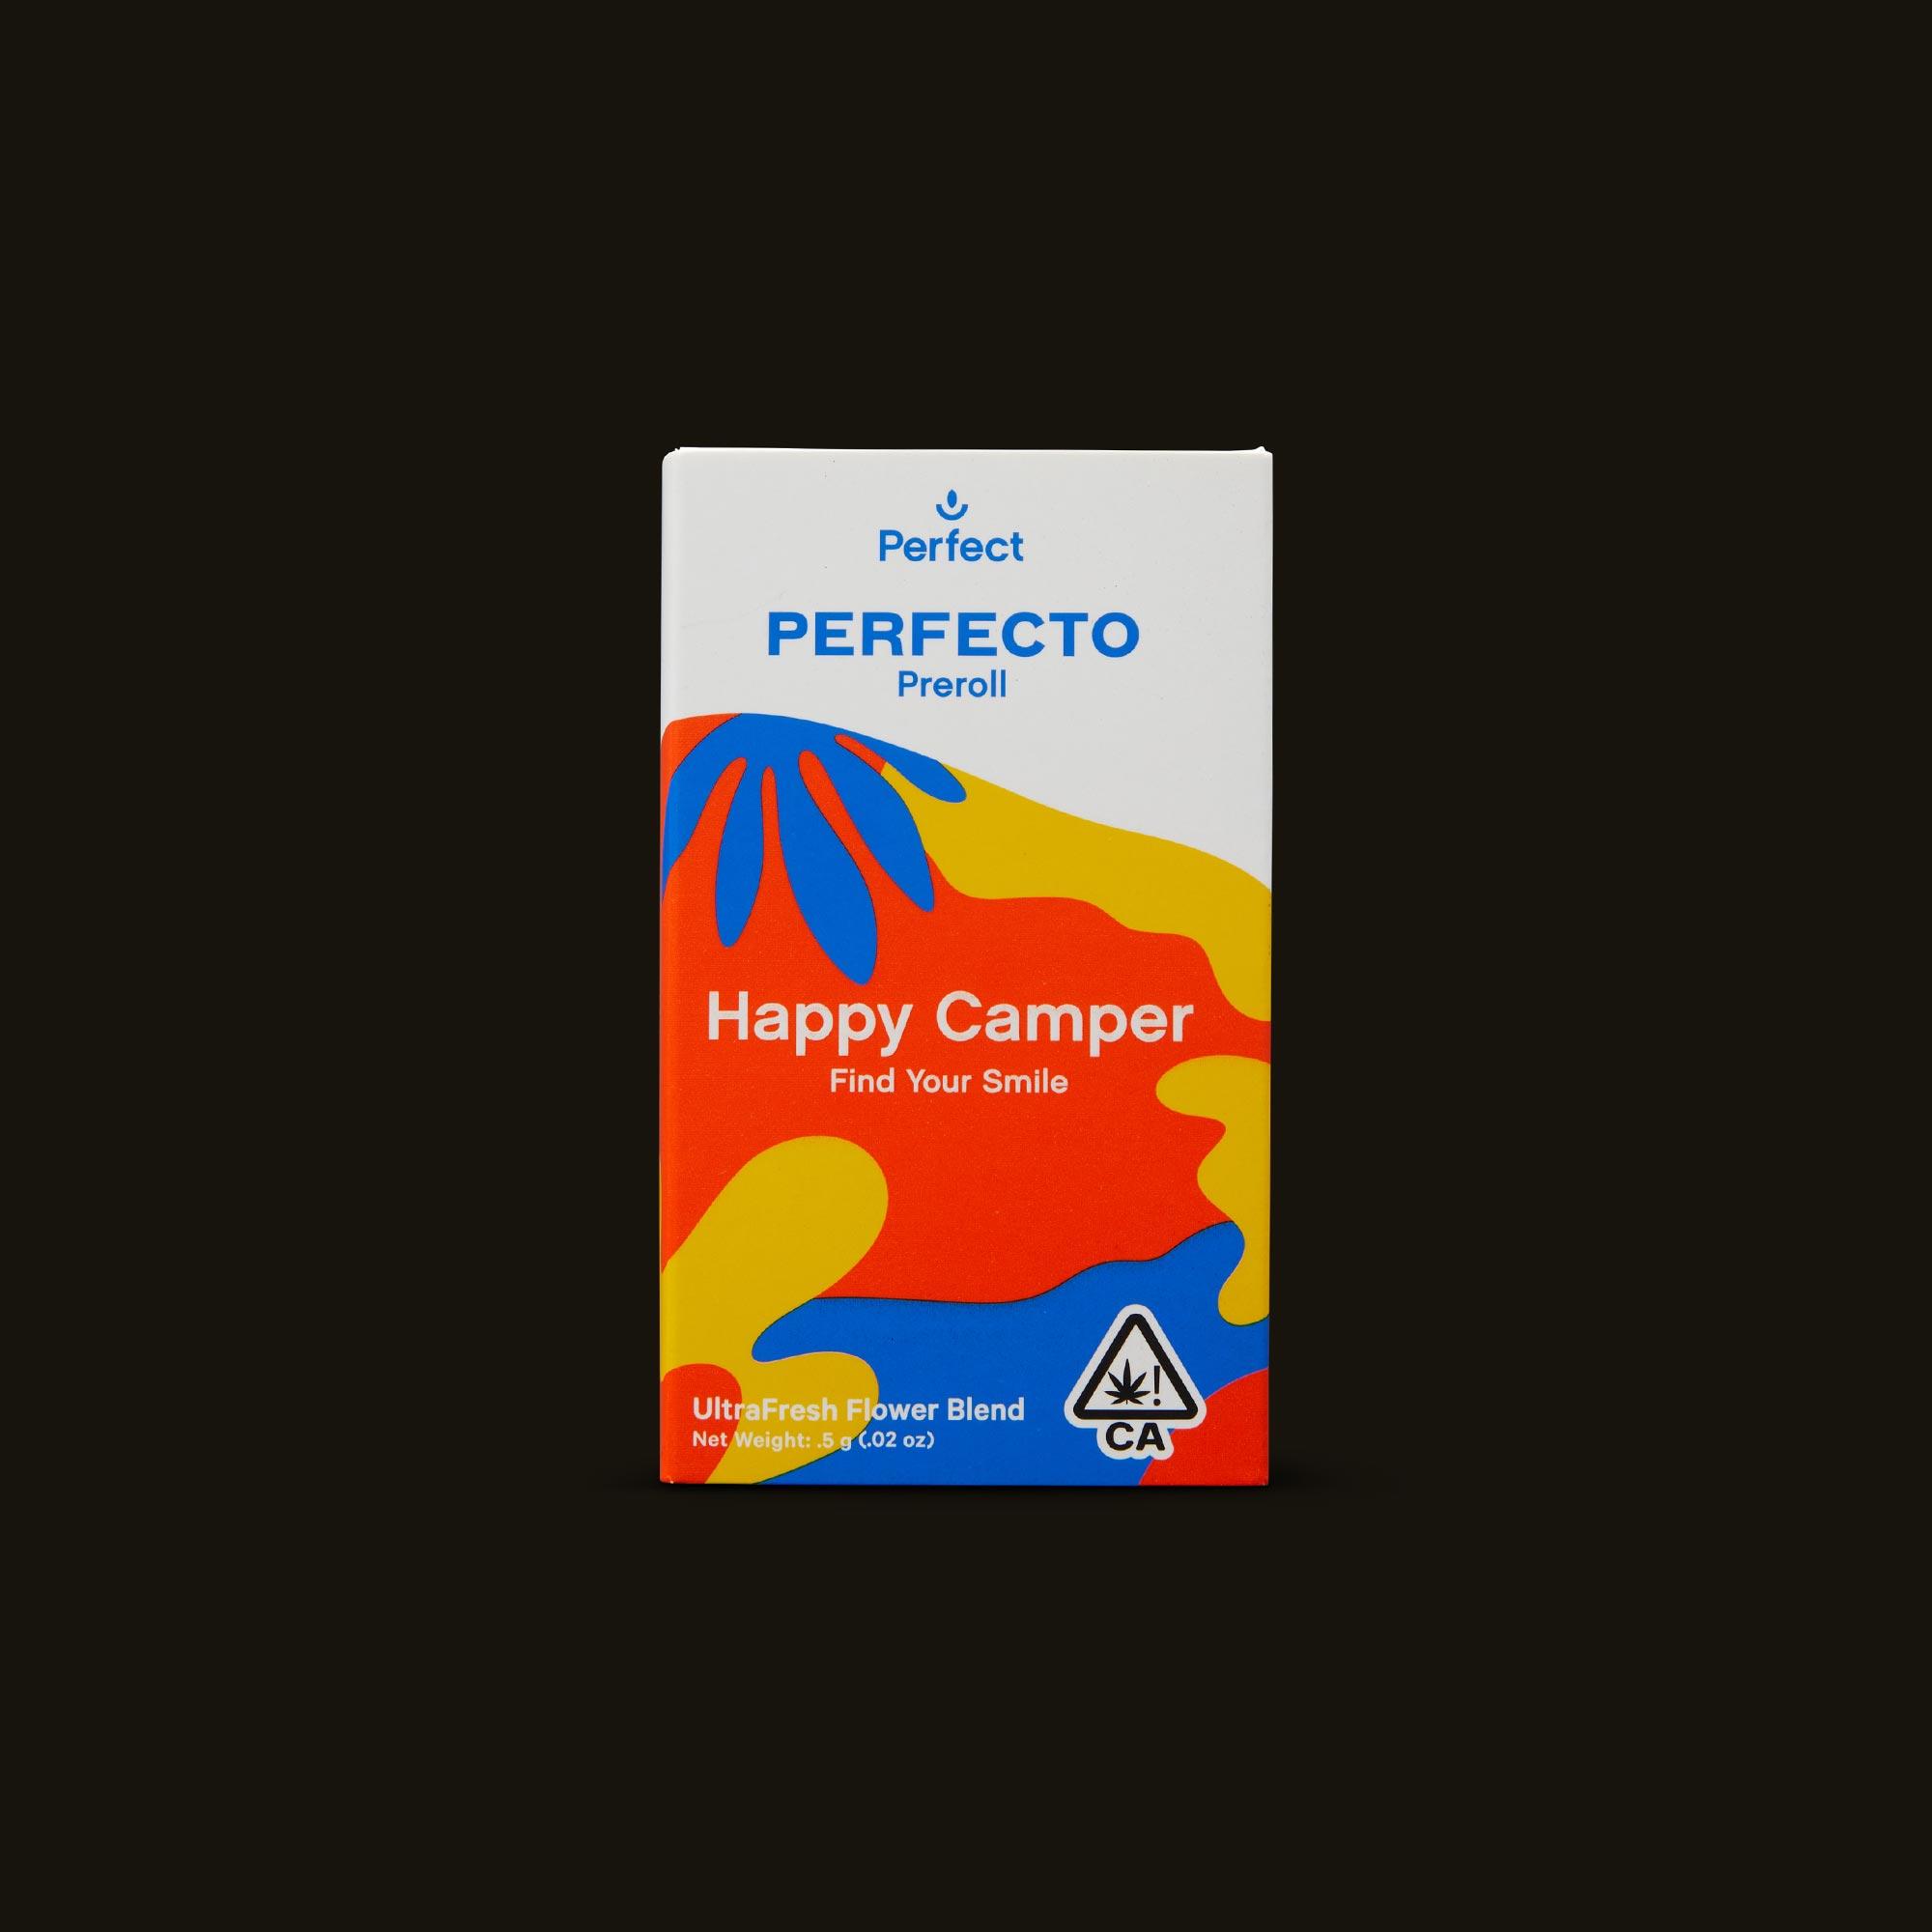 Perfect Happy Camper Perfecto Pre-Roll Front of Box